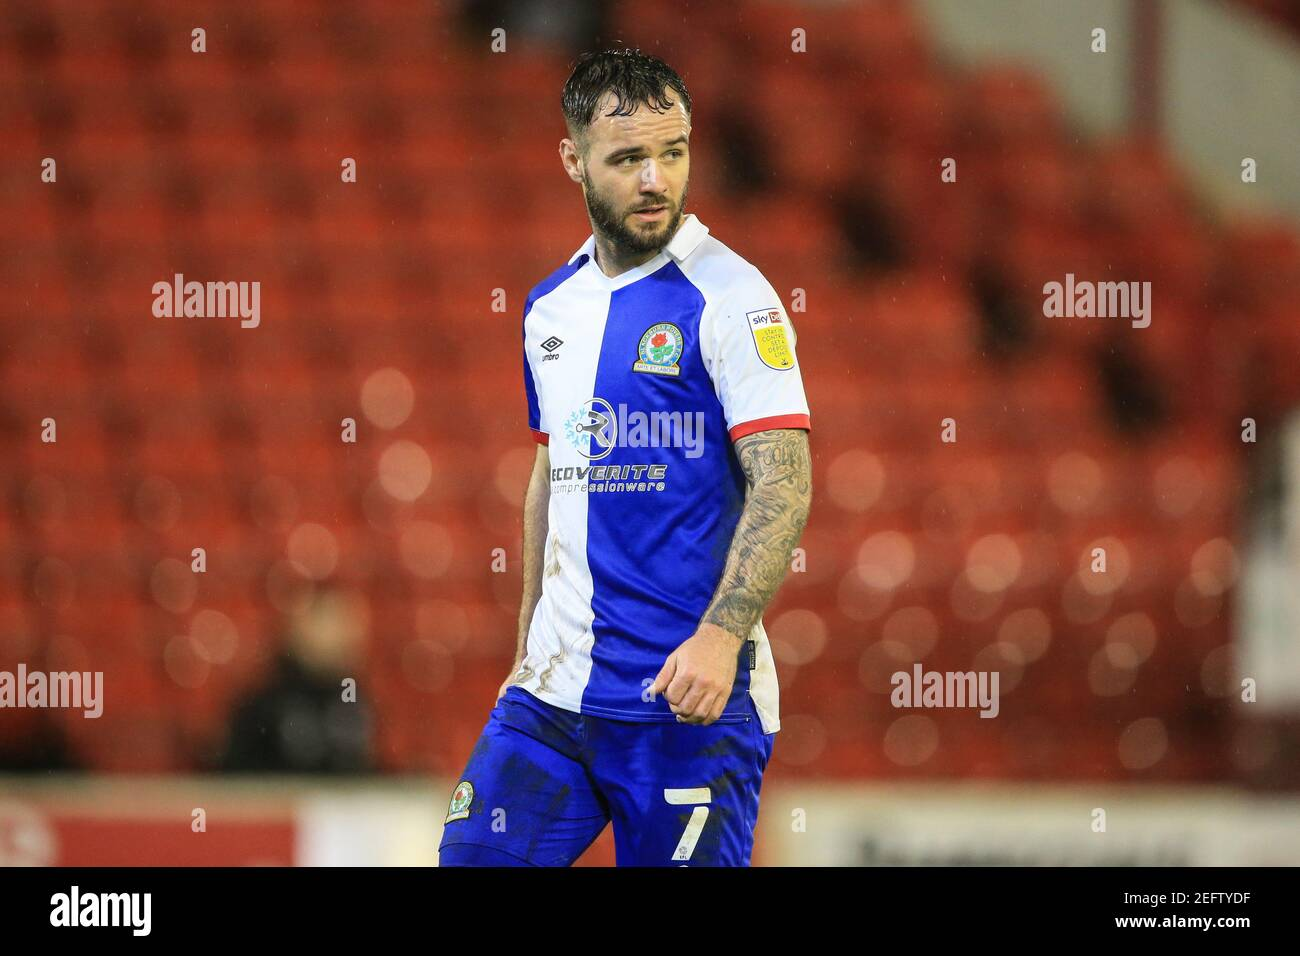 Barnsley, Royaume-Uni. 17 février 2021. Adam Armstrong #7 de Blackburn Rovers pendant le match à Barnsley, Royaume-Uni le 2/17/2021. (Photo de Mark Cosgrove/News Images/Sipa USA) crédit: SIPA USA/Alay Live News Banque D'Images